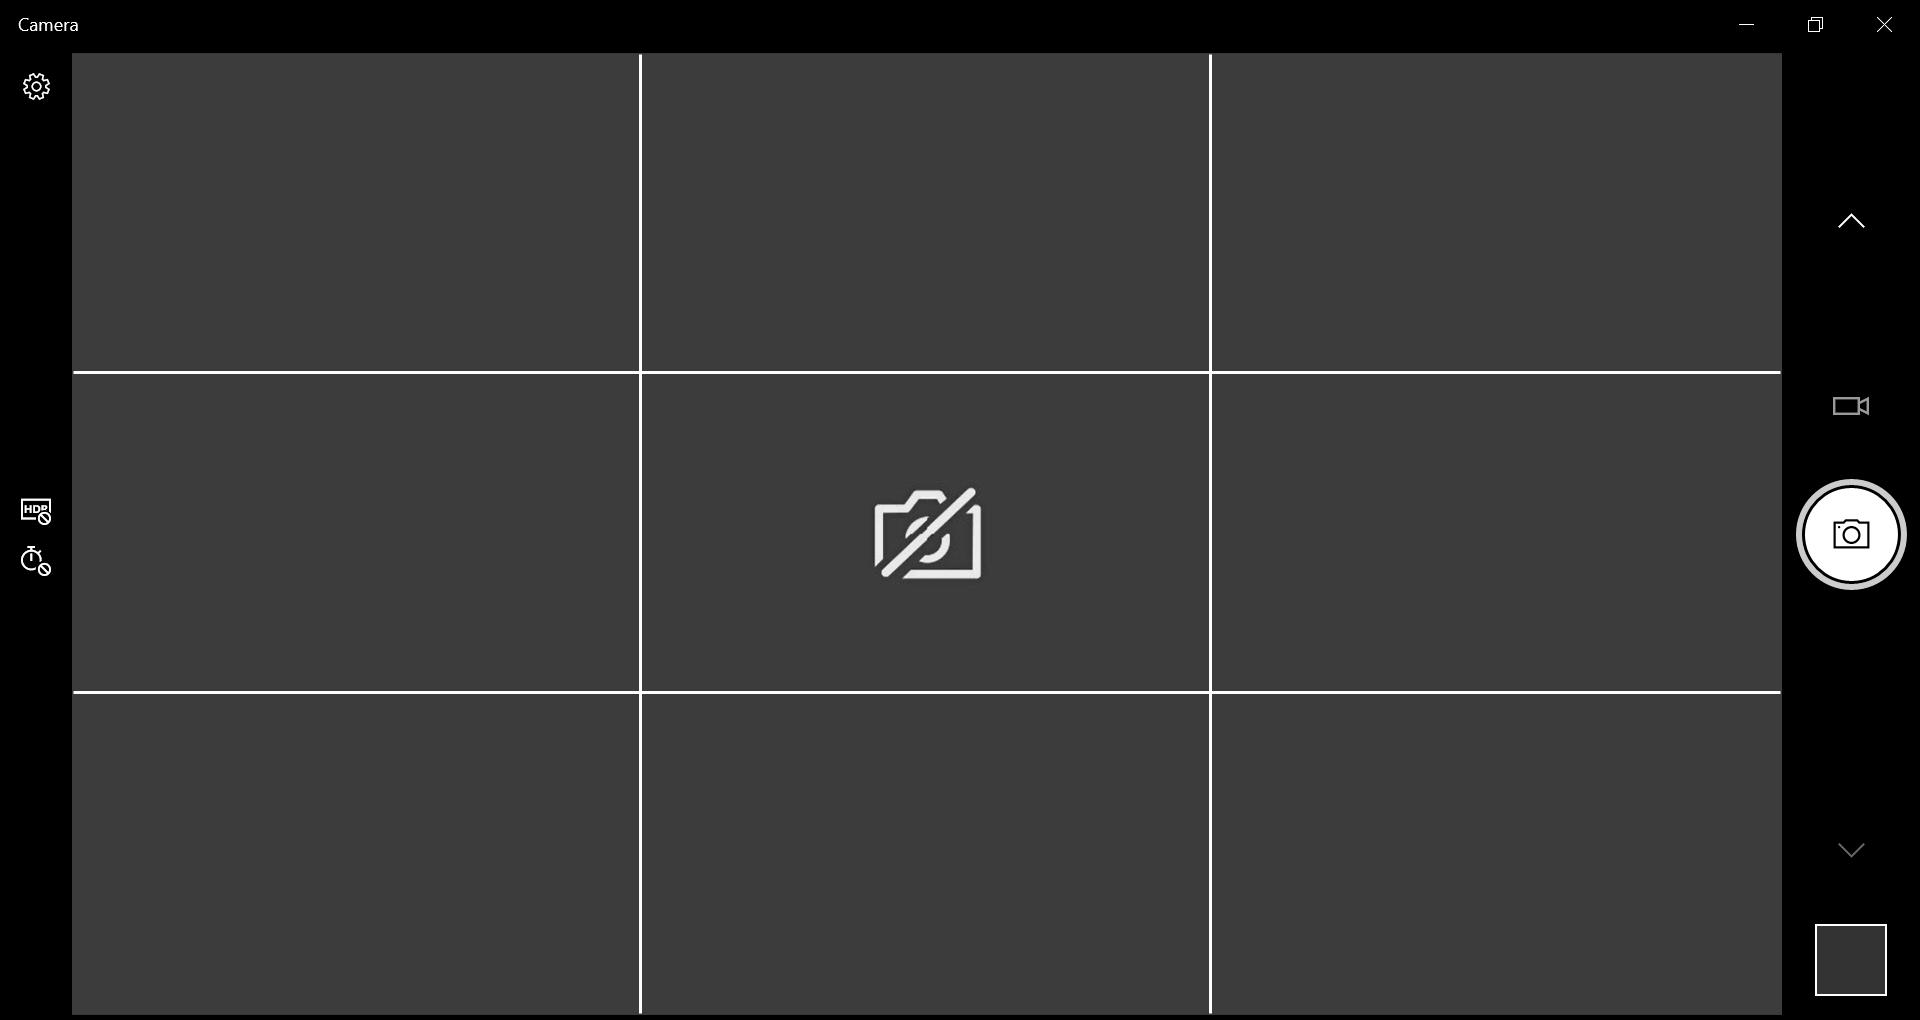 ASUS ZenBook Duo UX481FL - Camera Not Working